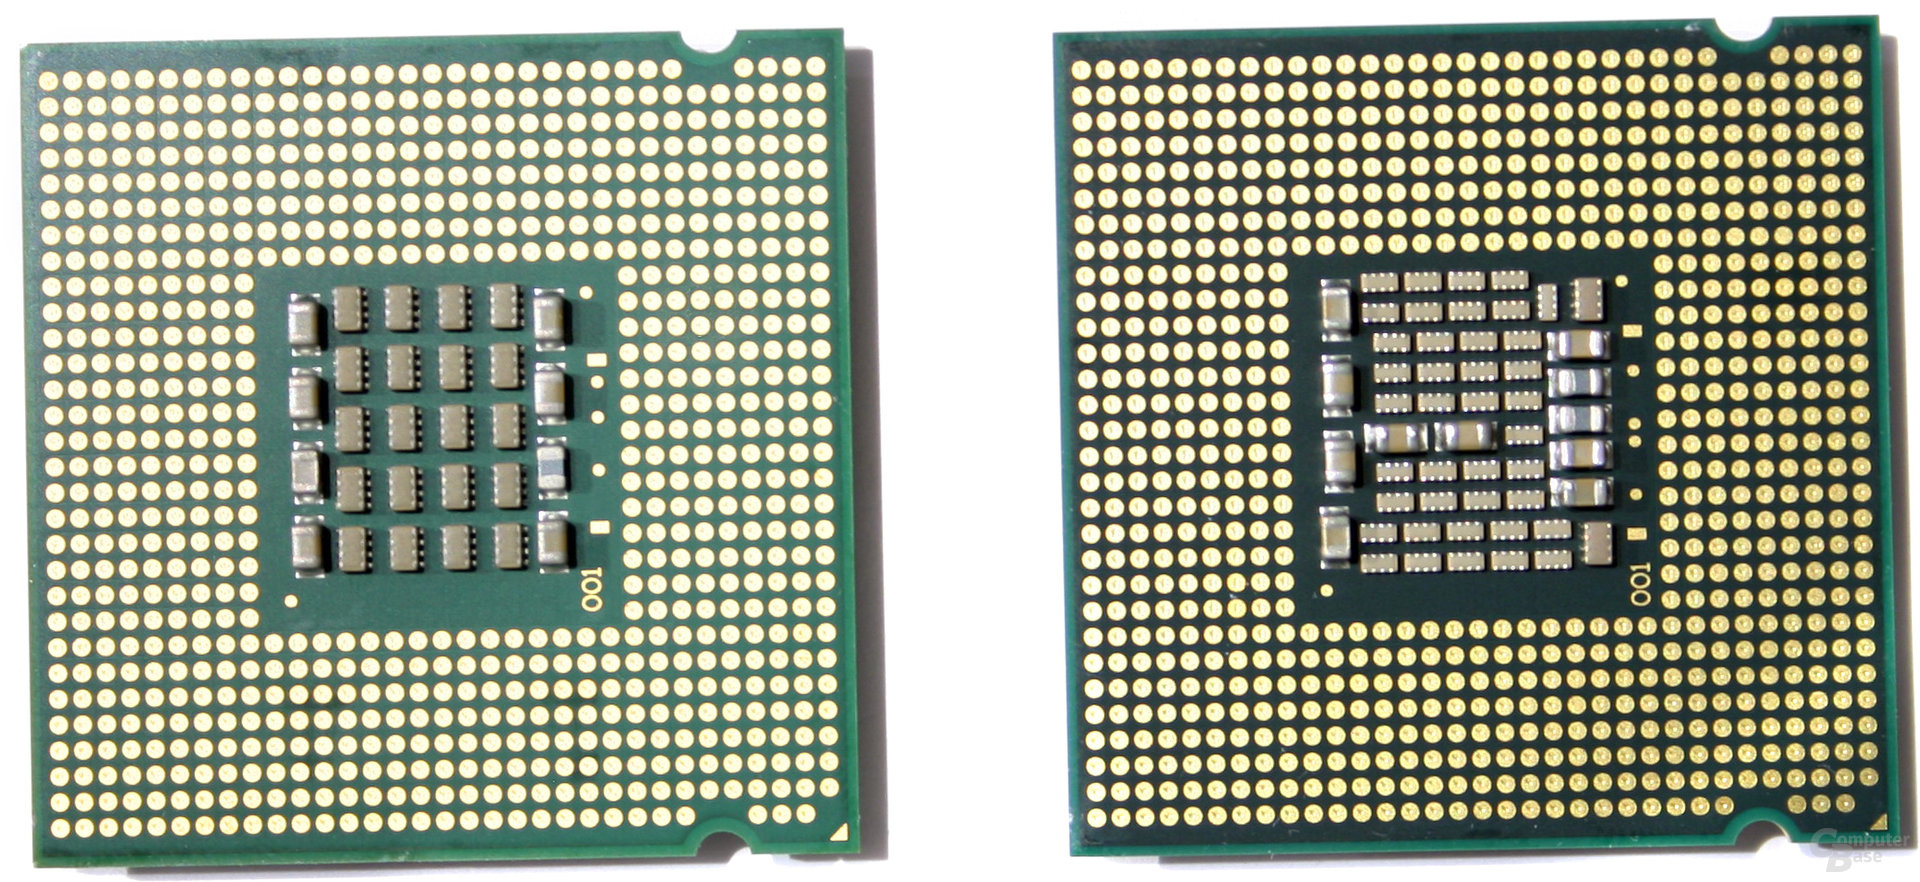 Pentium XE 840 (links) und XE 955 (rechts)